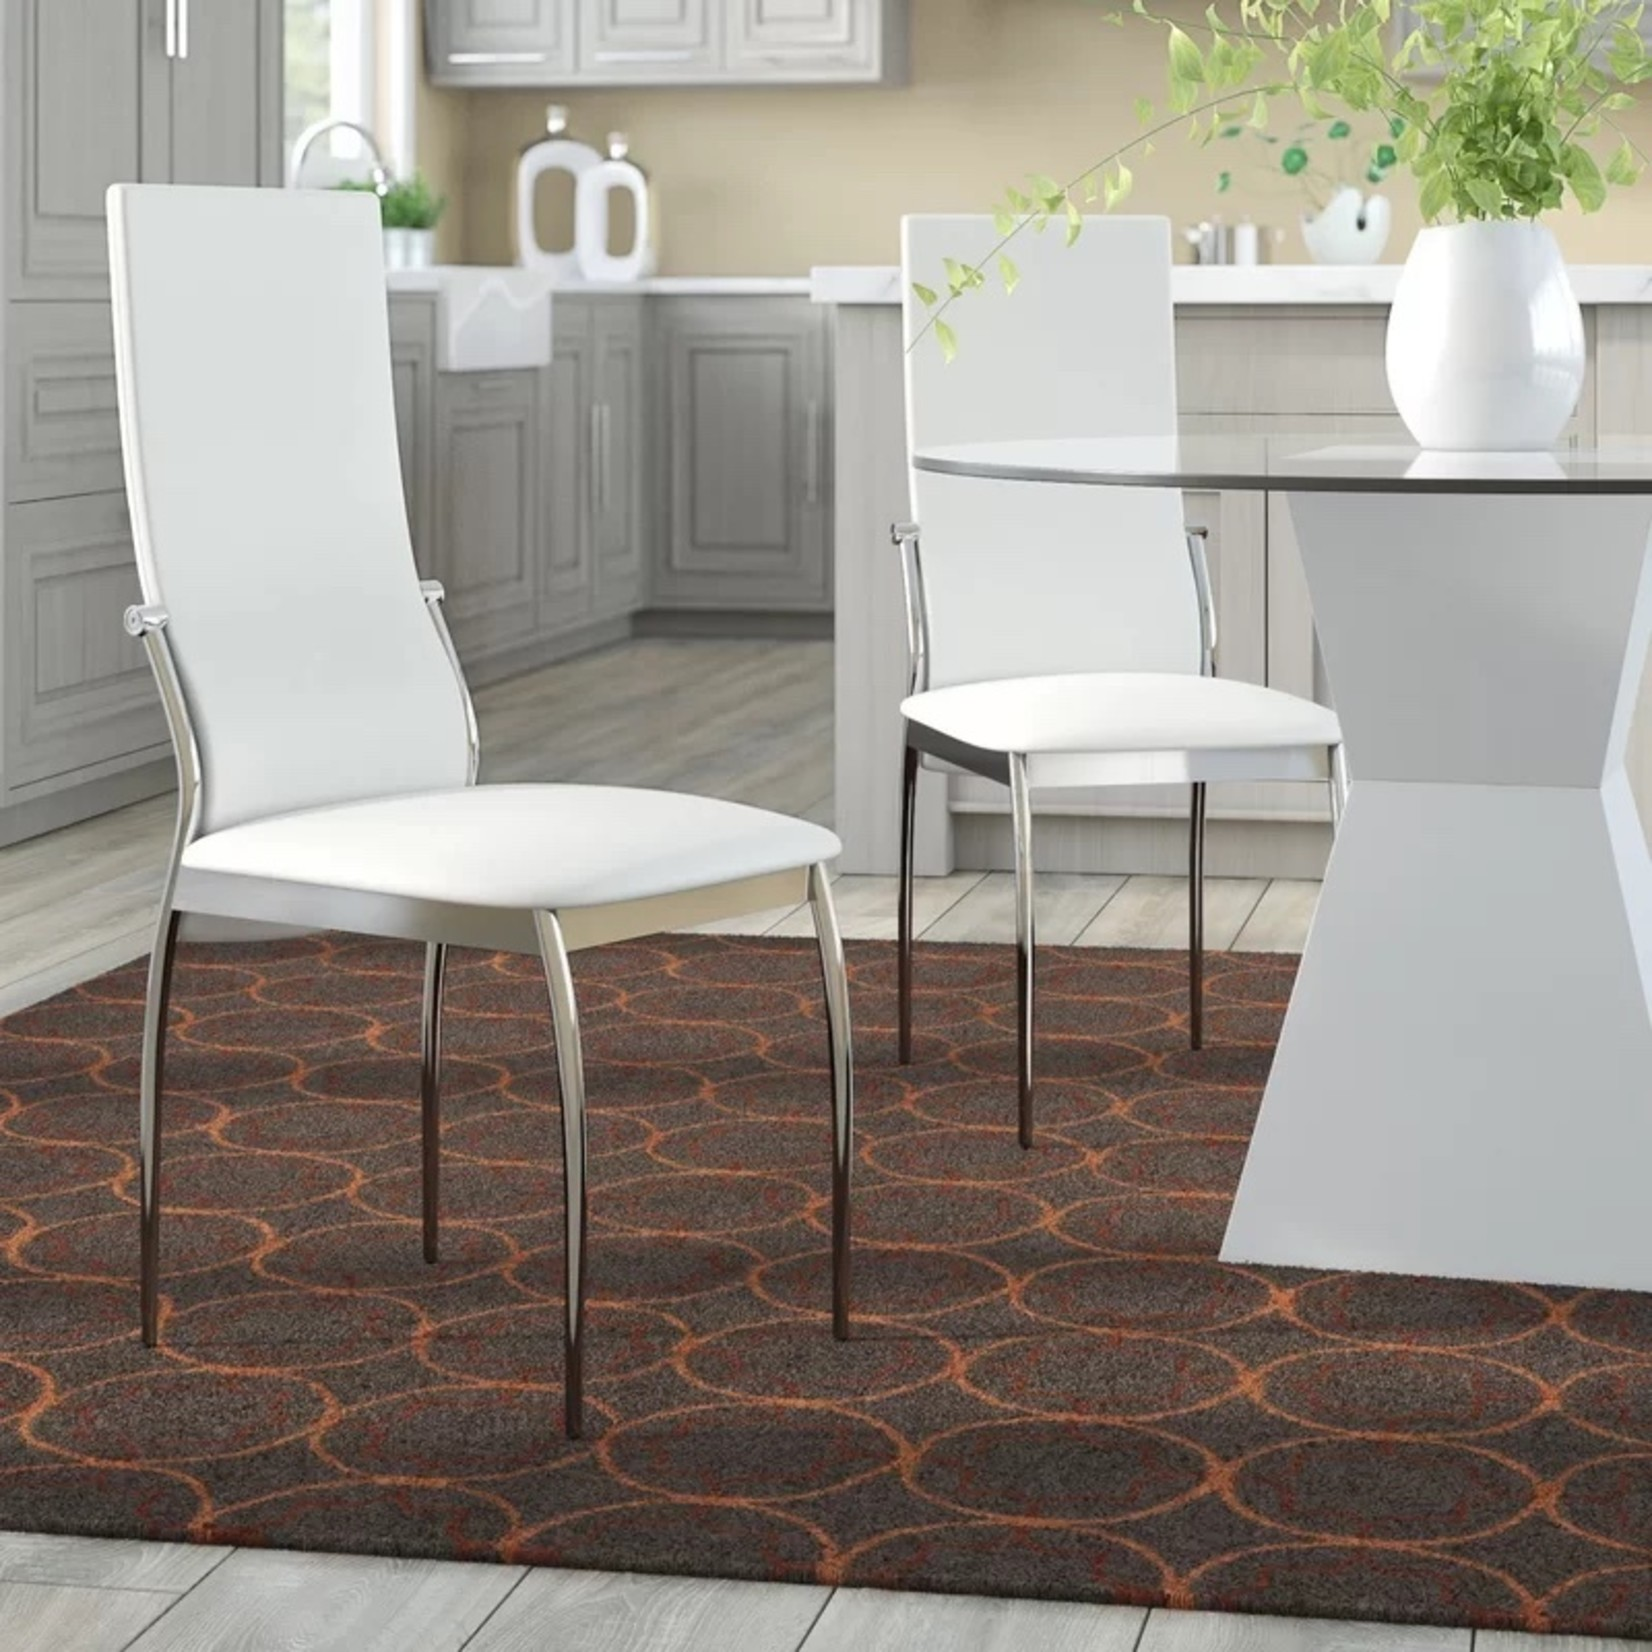 *Hemsworth Dining Chairs (Set of 2)